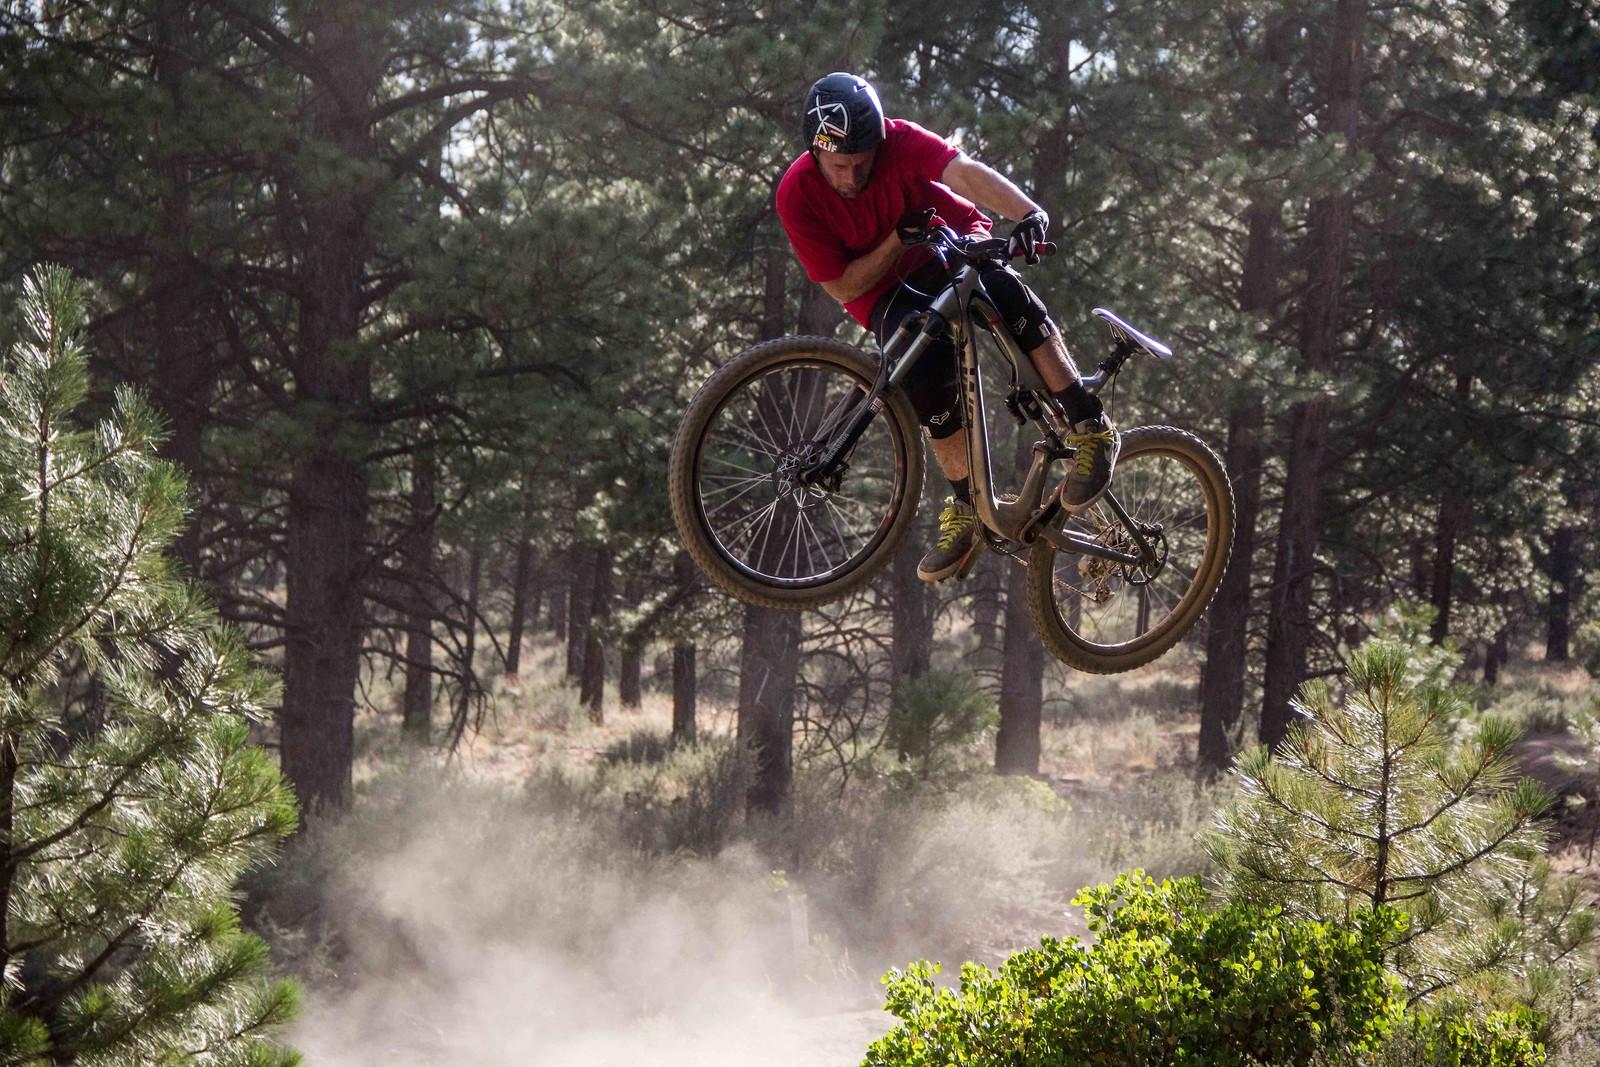 Voreis  - Yuroshek - Mountain Biking Pictures - Vital MTB